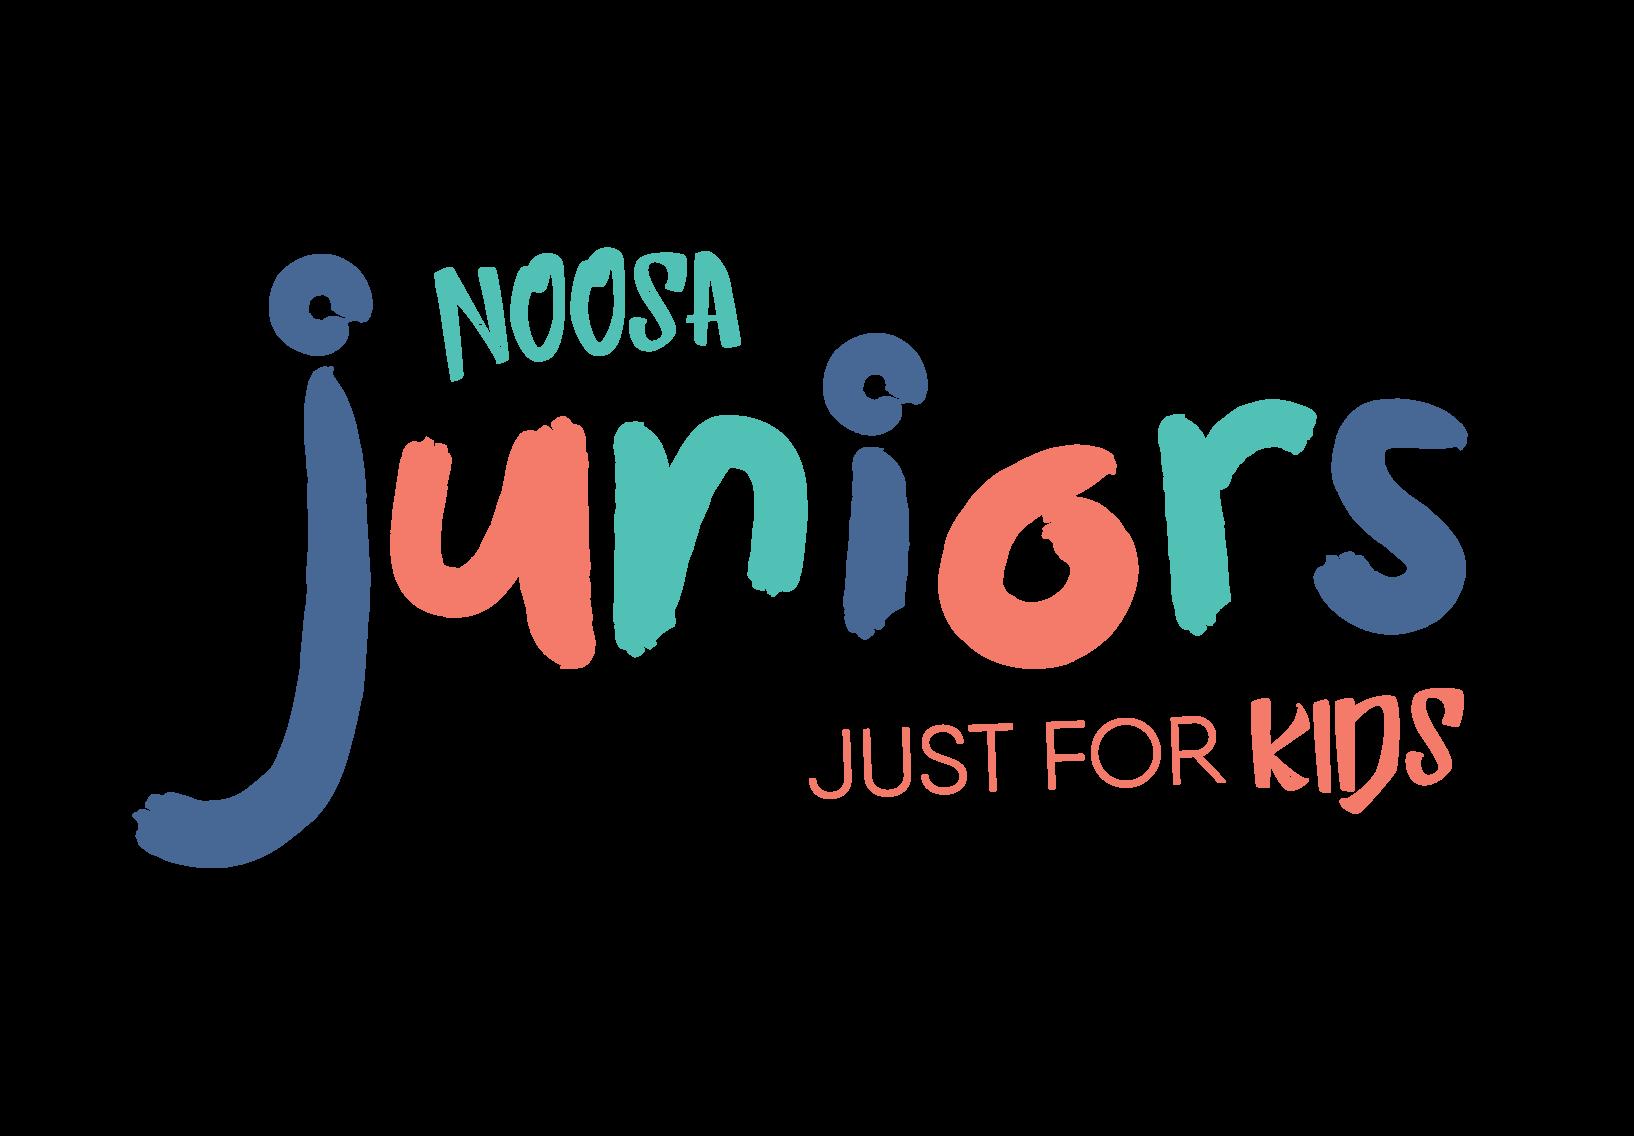 Noosa Juniors